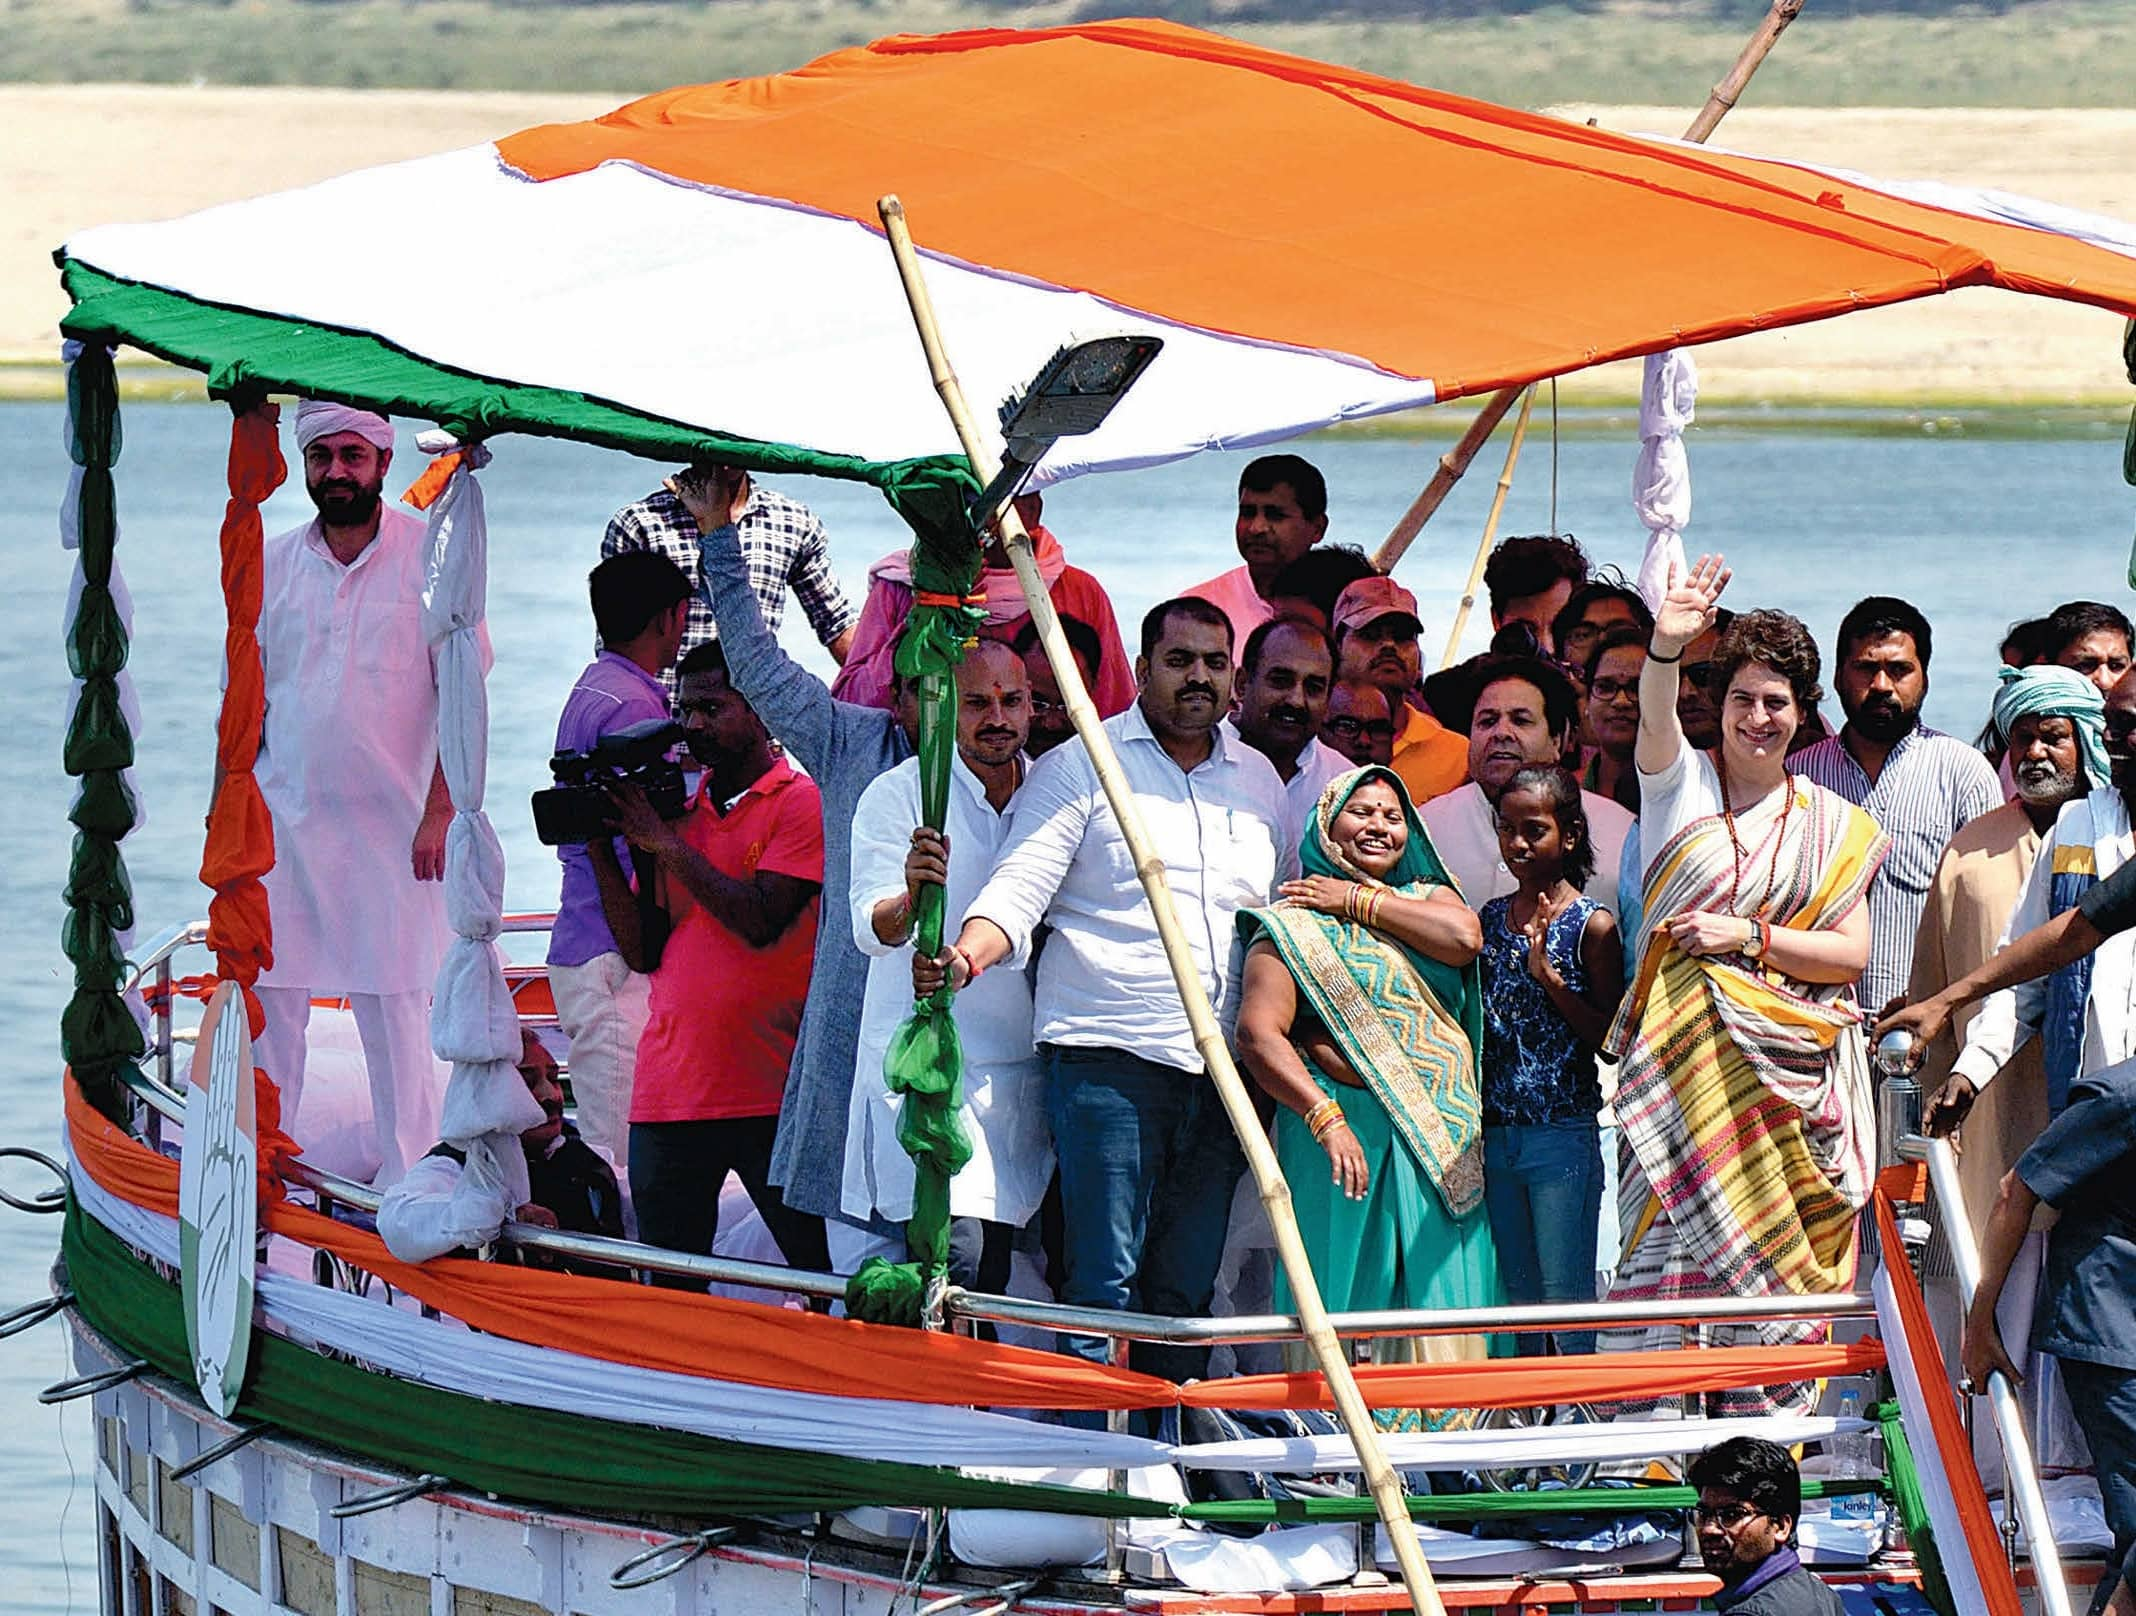 Priyanka Gandhi's Ganga Yatra To Revive The Congress In Uttar Pradesh